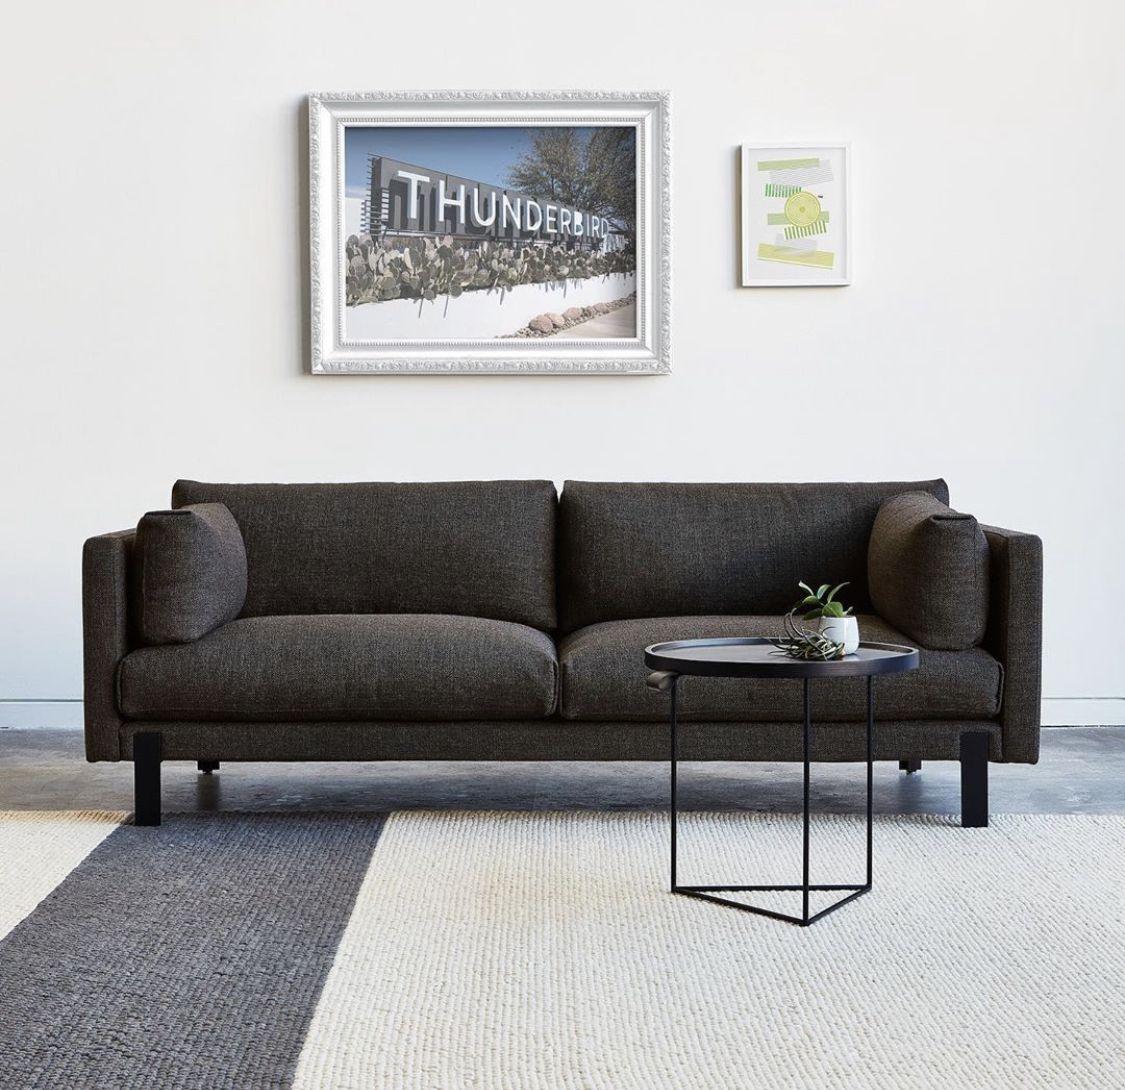 Gus Summer Sale In 2020 Gus Modern Sofa Seat Design